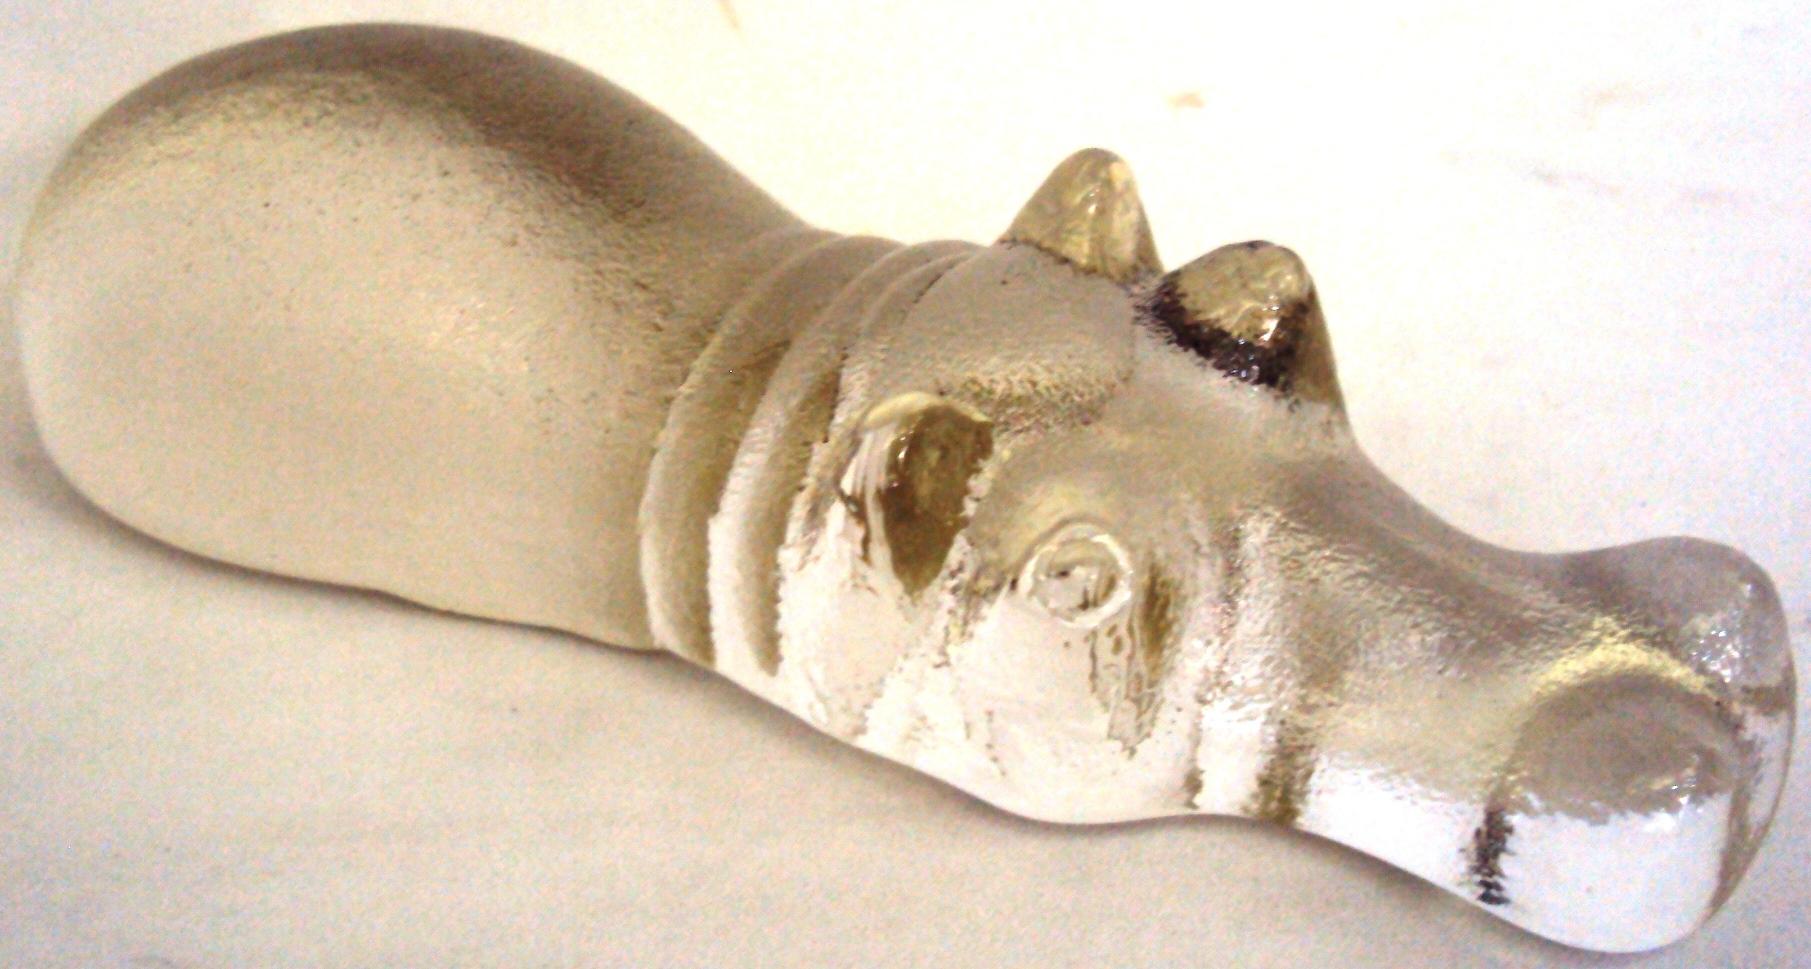 CR 248 – Peso De Papel ou enfeite de Hipopótamo De Vidro Grande